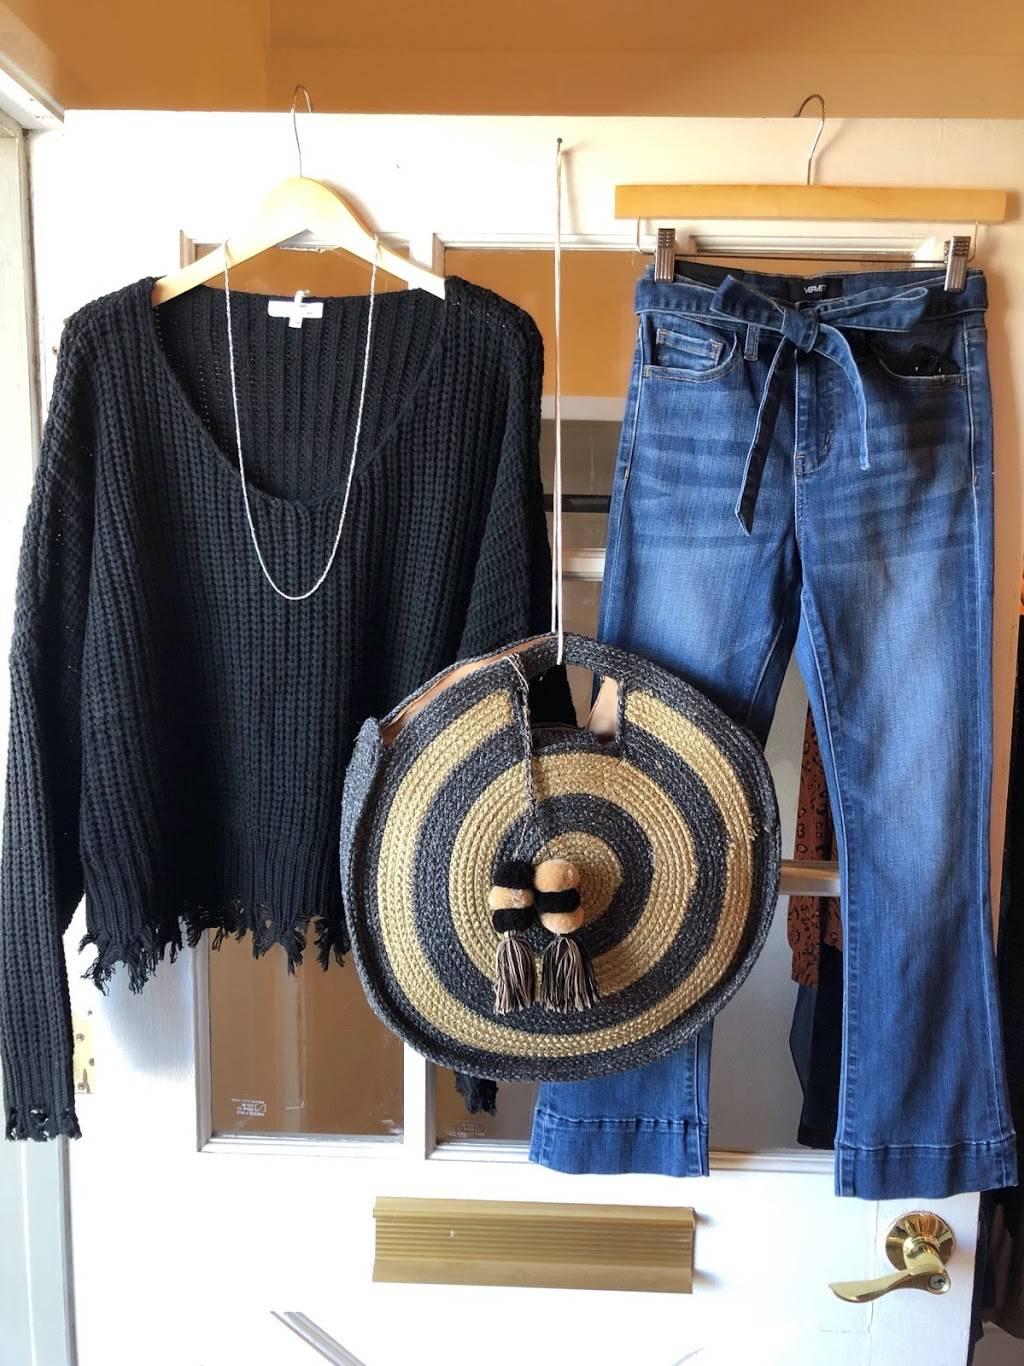 Wild Poppy Boutique | shopping mall | 1095 Meadowvale Rd G1, Santa Ynez, CA 93460, USA | 8056977876 OR +1 805-697-7876